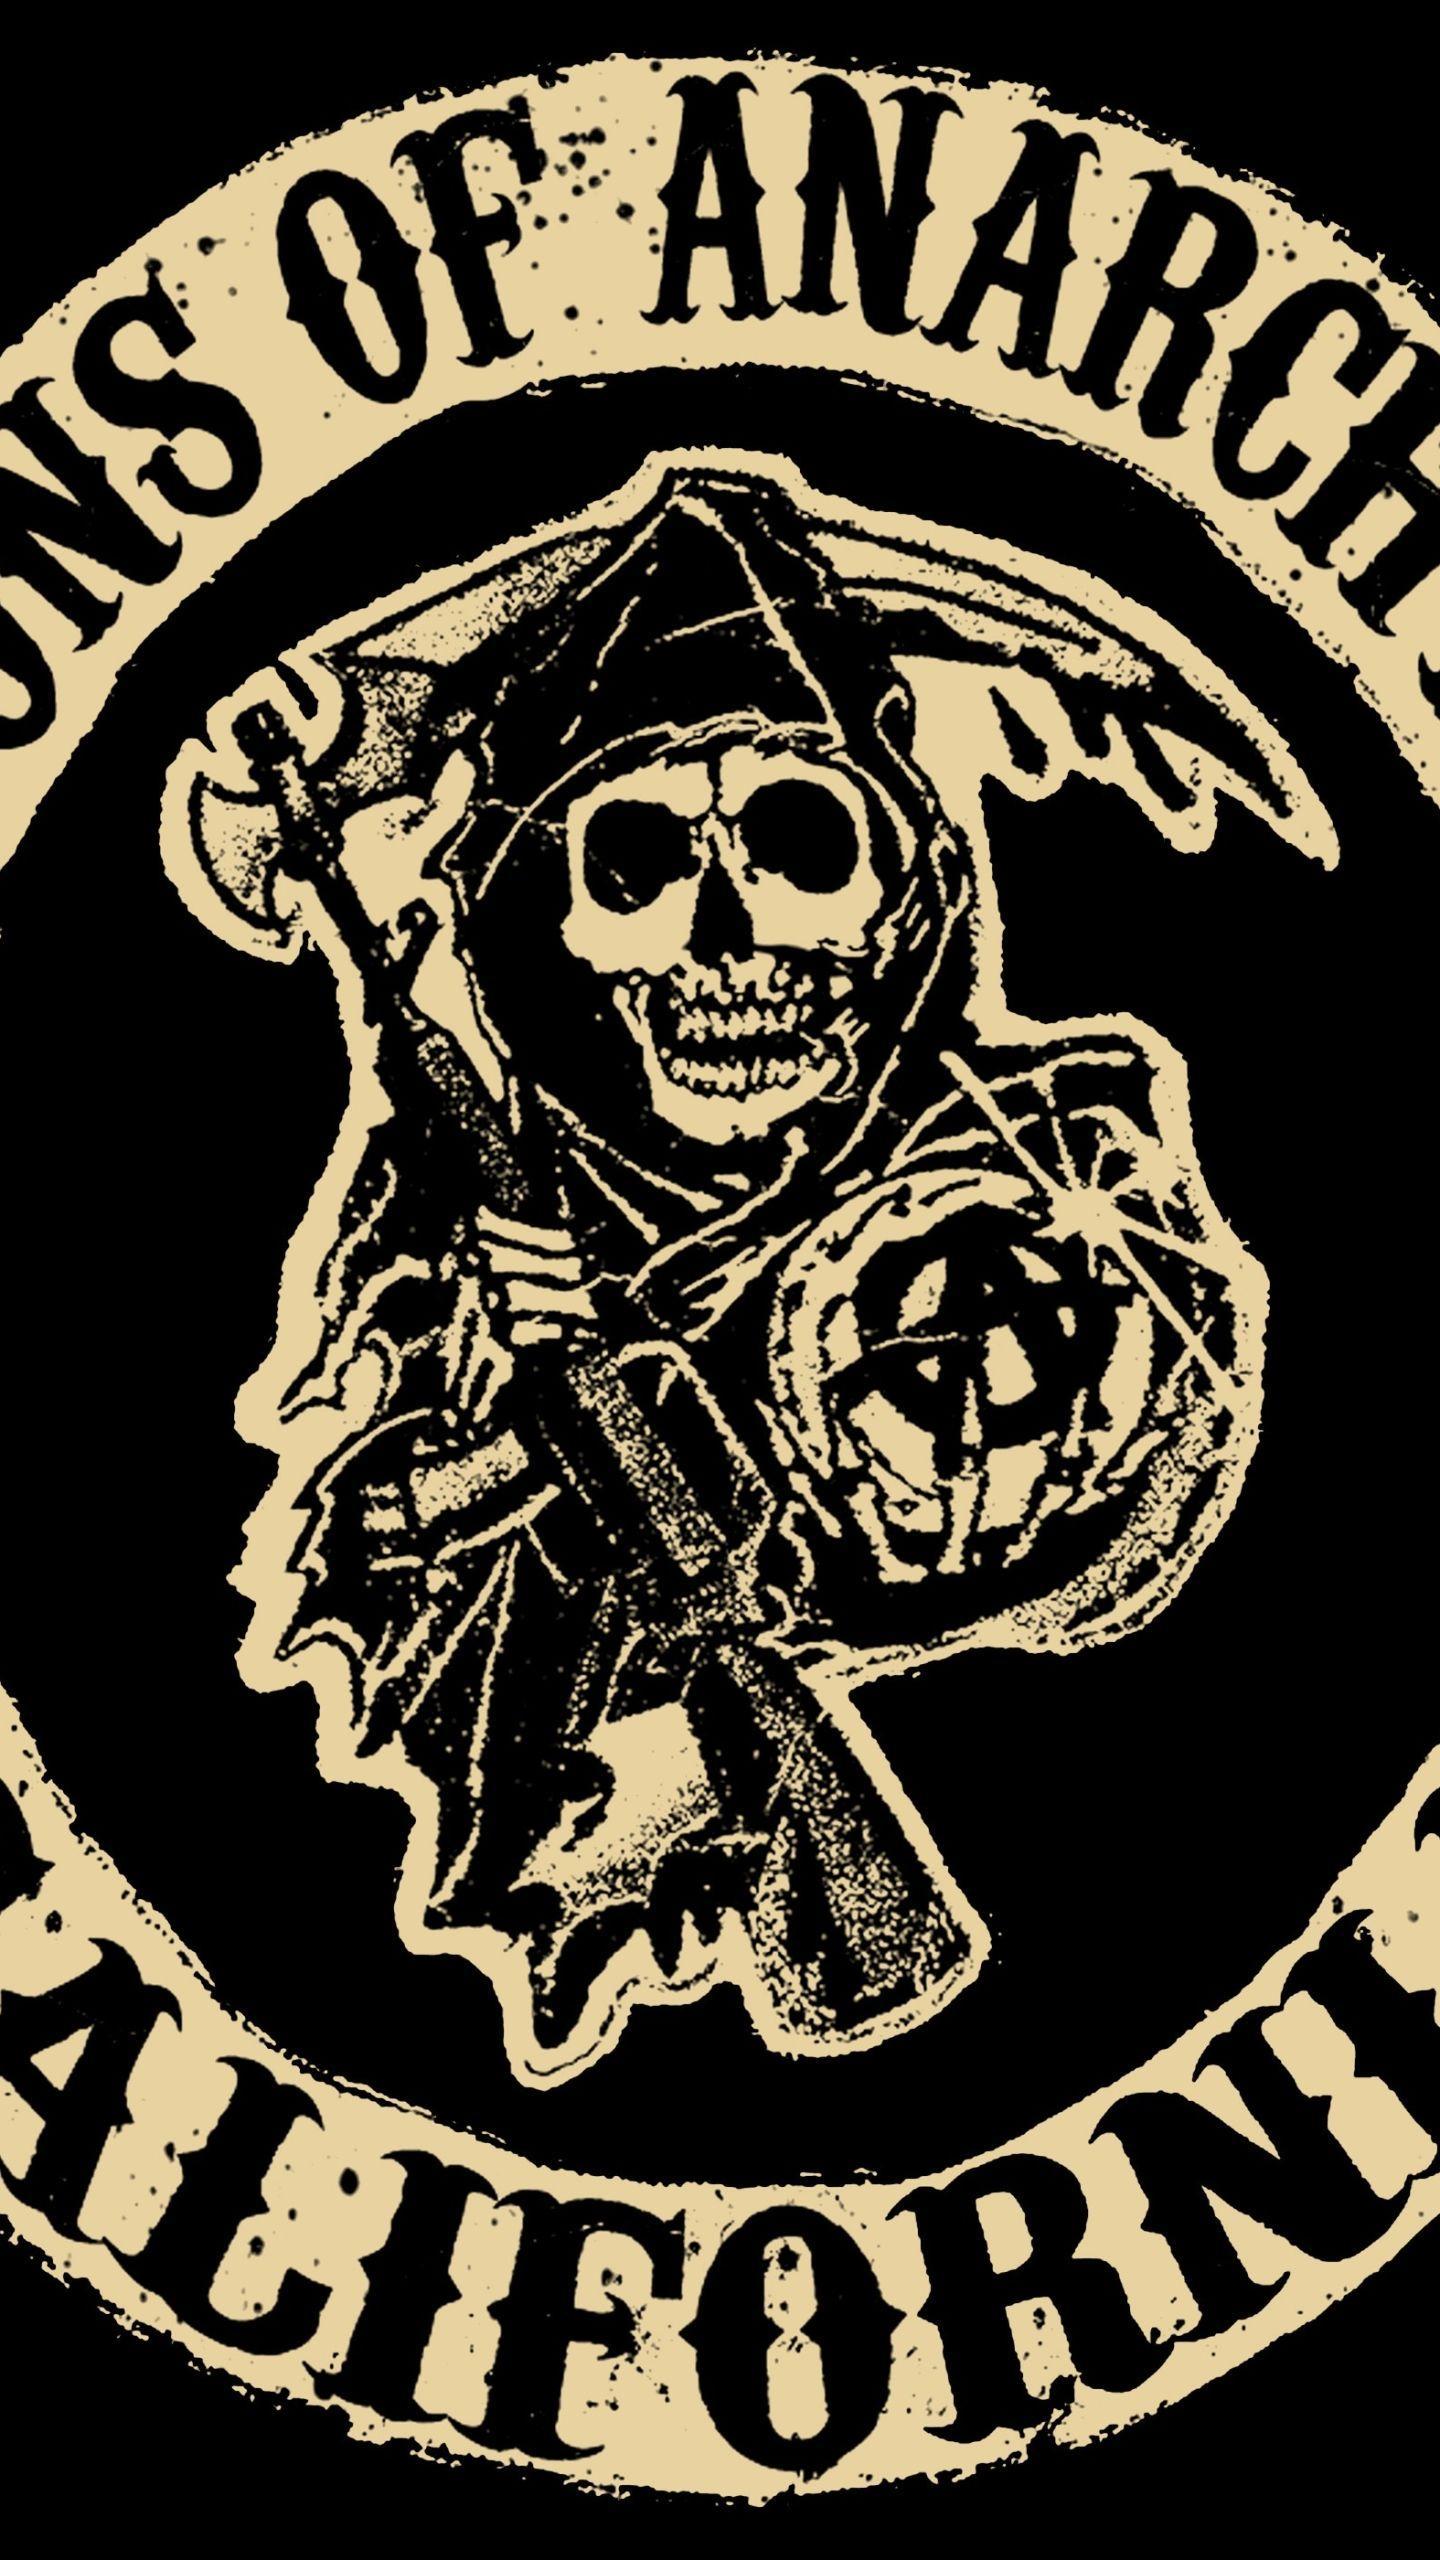 Sons Of Anarchy Wallpaper : anarchy, wallpaper, Anarchy, Wallpapers, Phone, Wallpaper